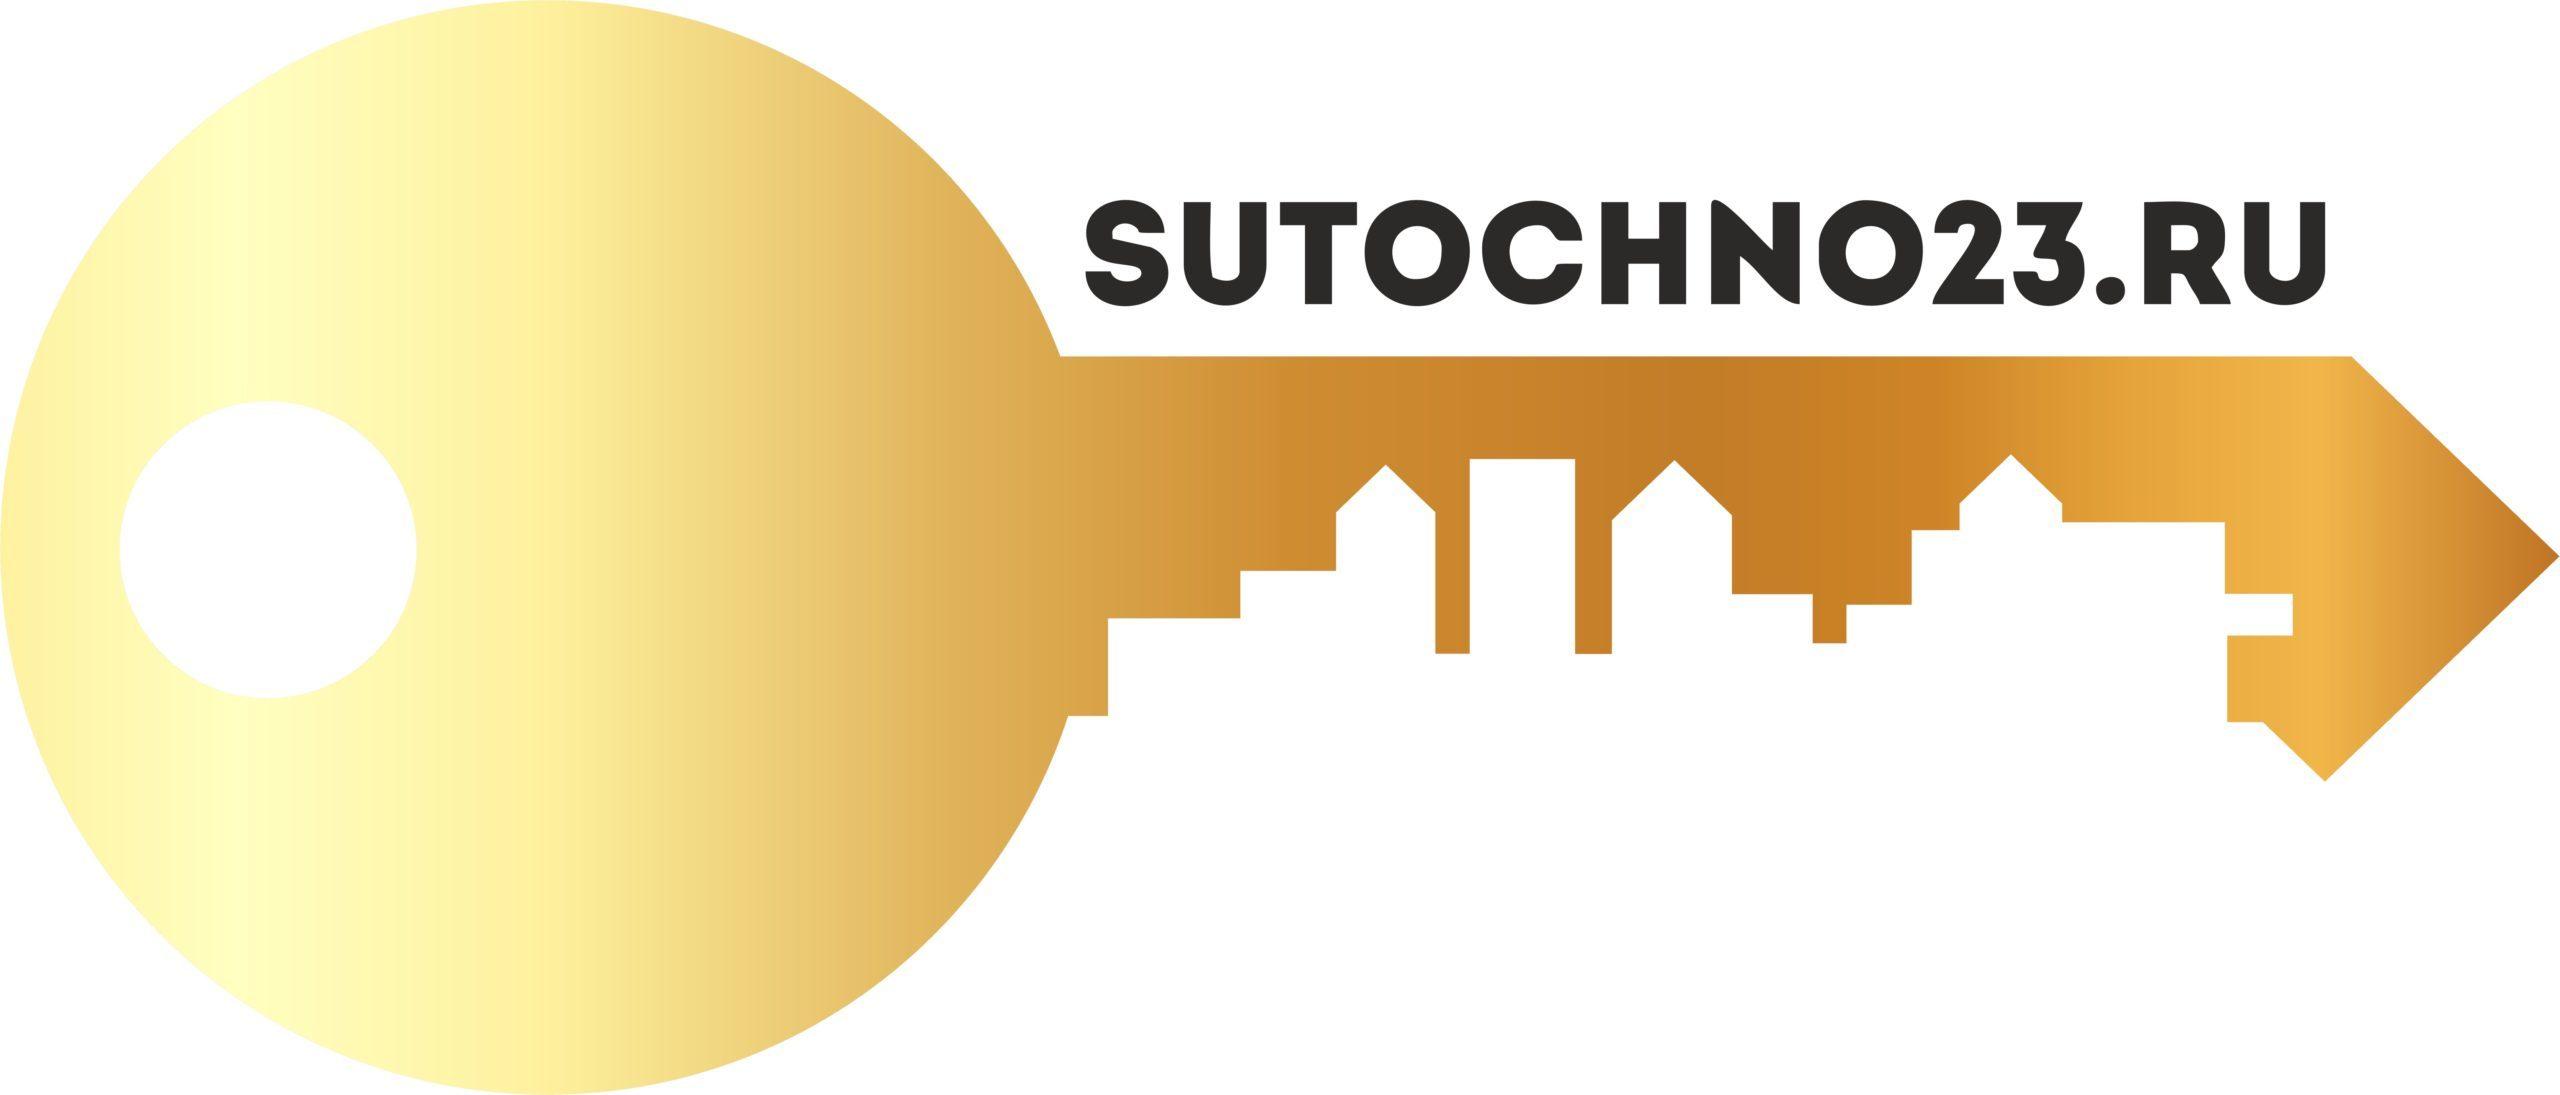 sutochno23.ru